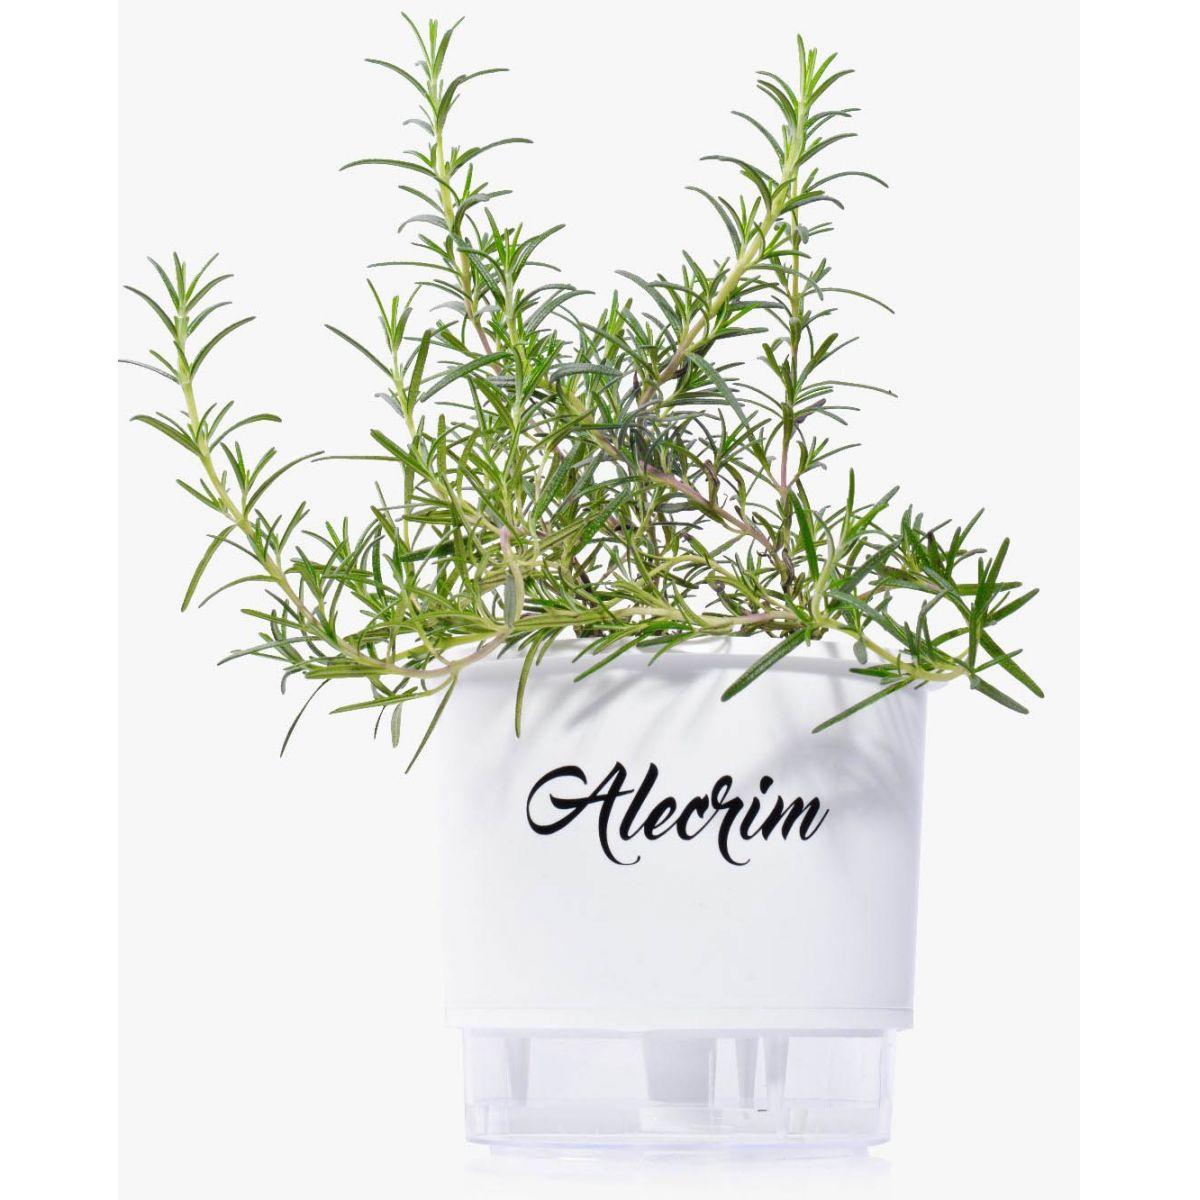 Vaso com reservat�rio de �gua (Autoirrig�vel) M�dio Branco Linha Gourmet 16 cm x 14 cm